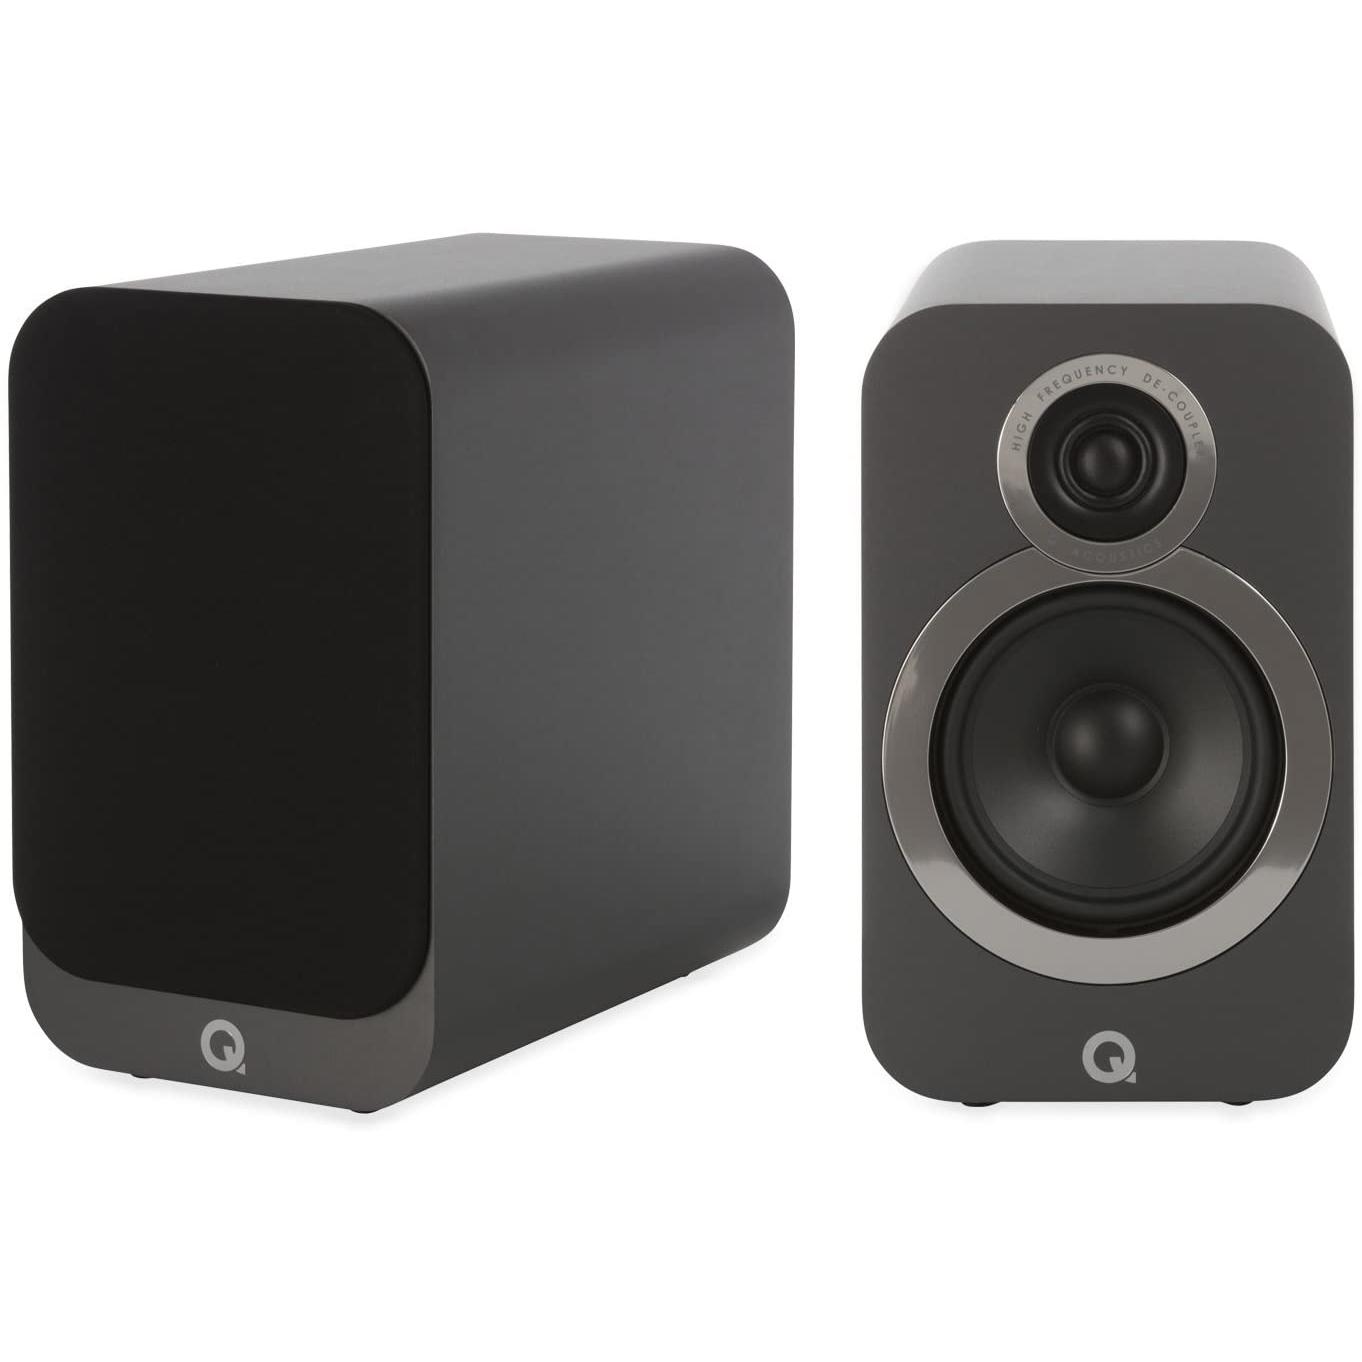 Q Acoustics 3020i Bookshelf Speakers